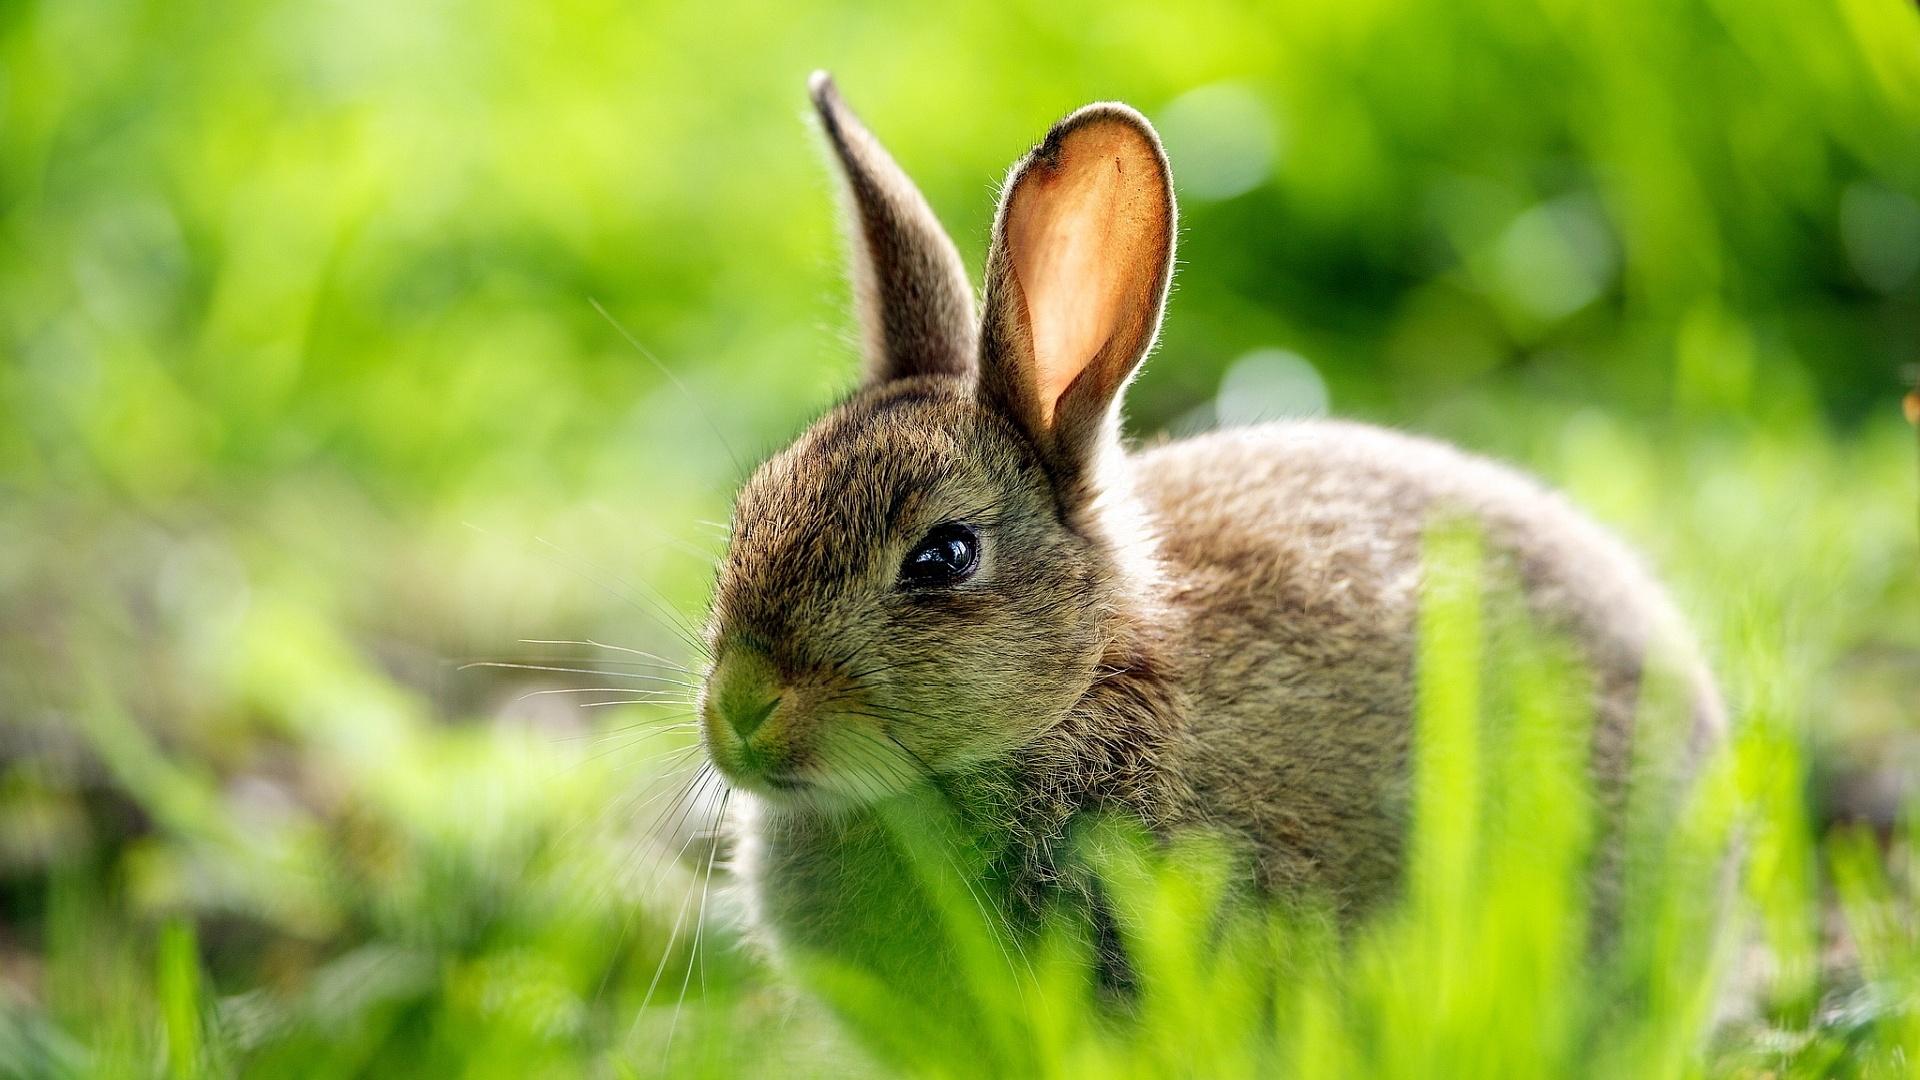 Cute Rabbit Pic